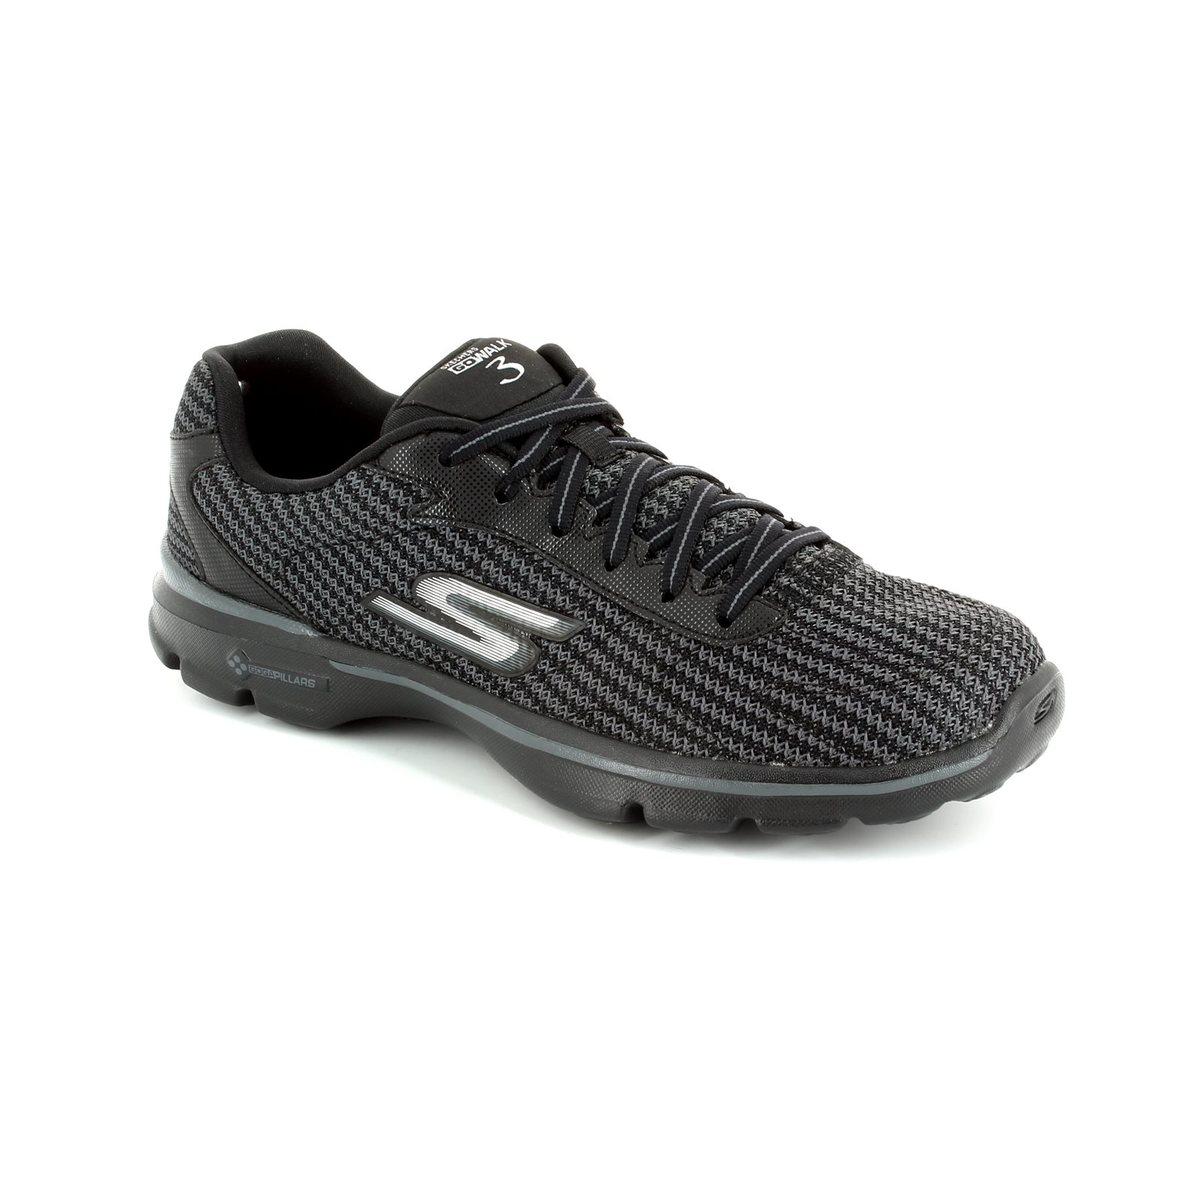 Skechers Trainers - Black - 13981 GO WALK 3 LACE